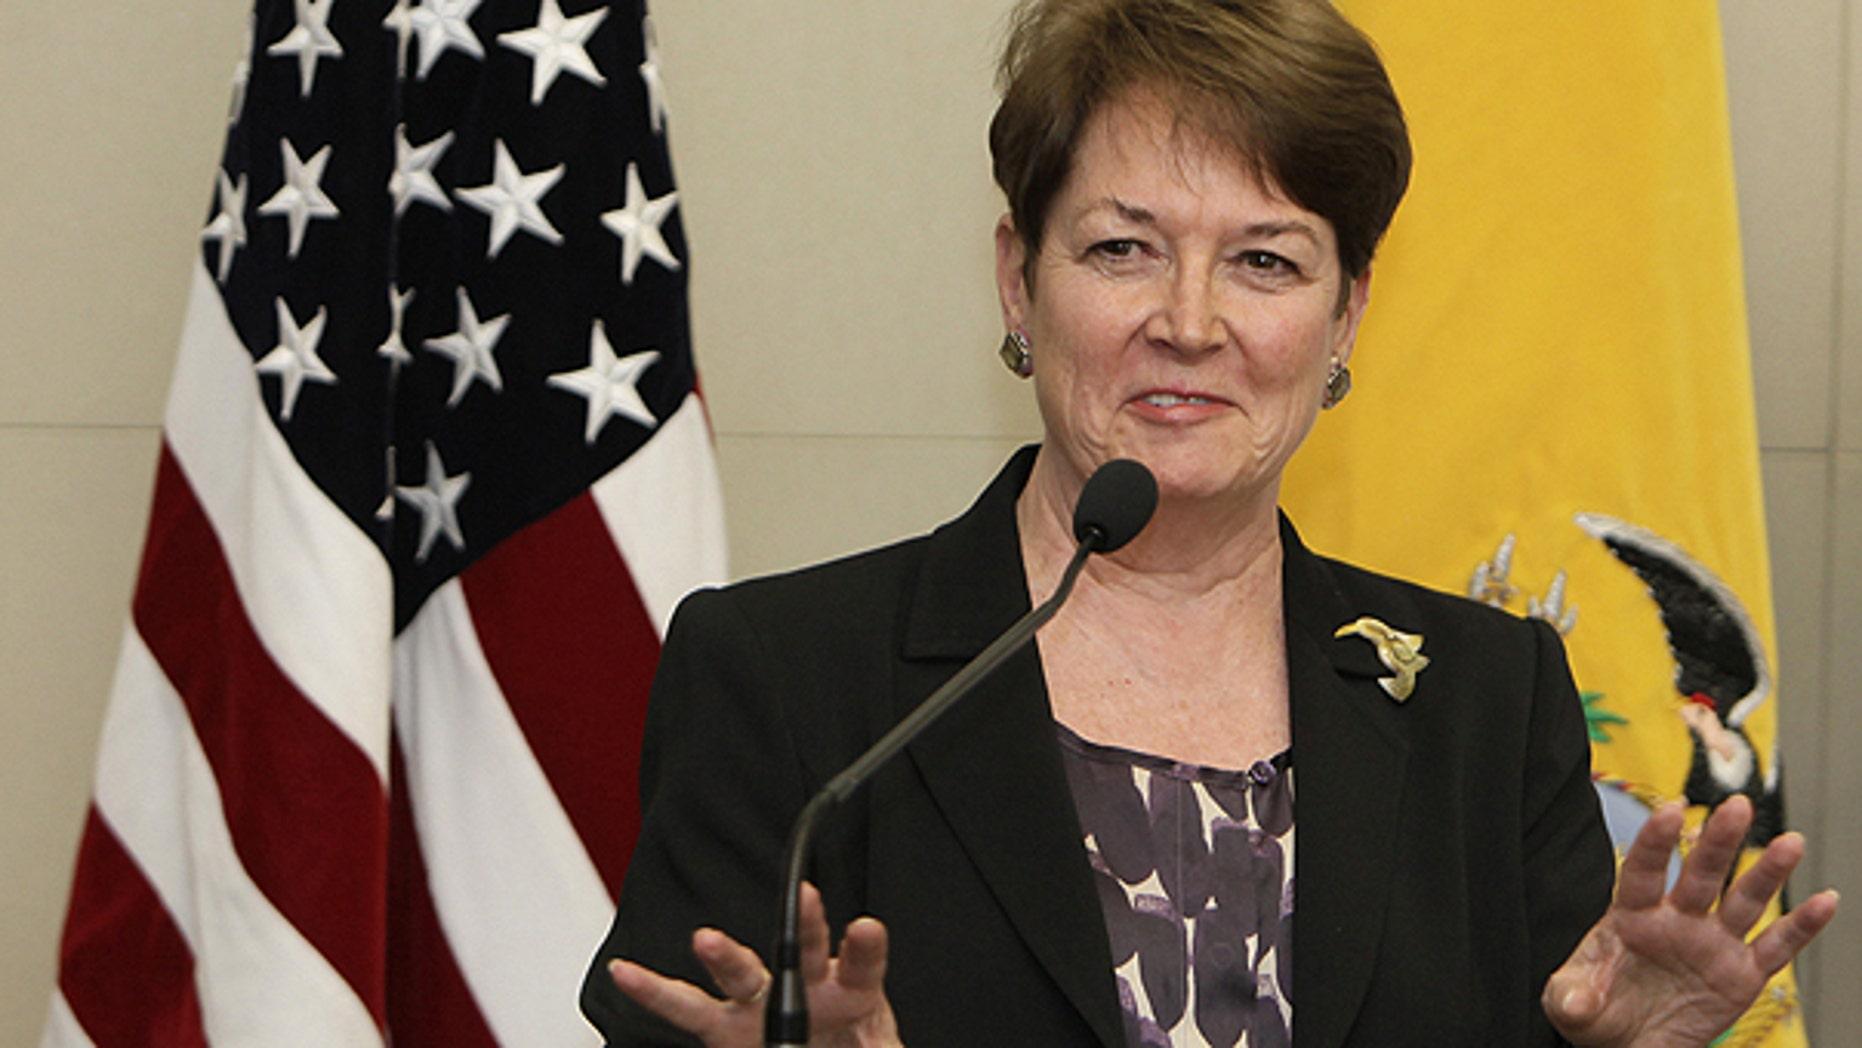 April 5: U.S. ambassador to Ecuador Heather Hodges gives a press conference in Quito, Ecuador.